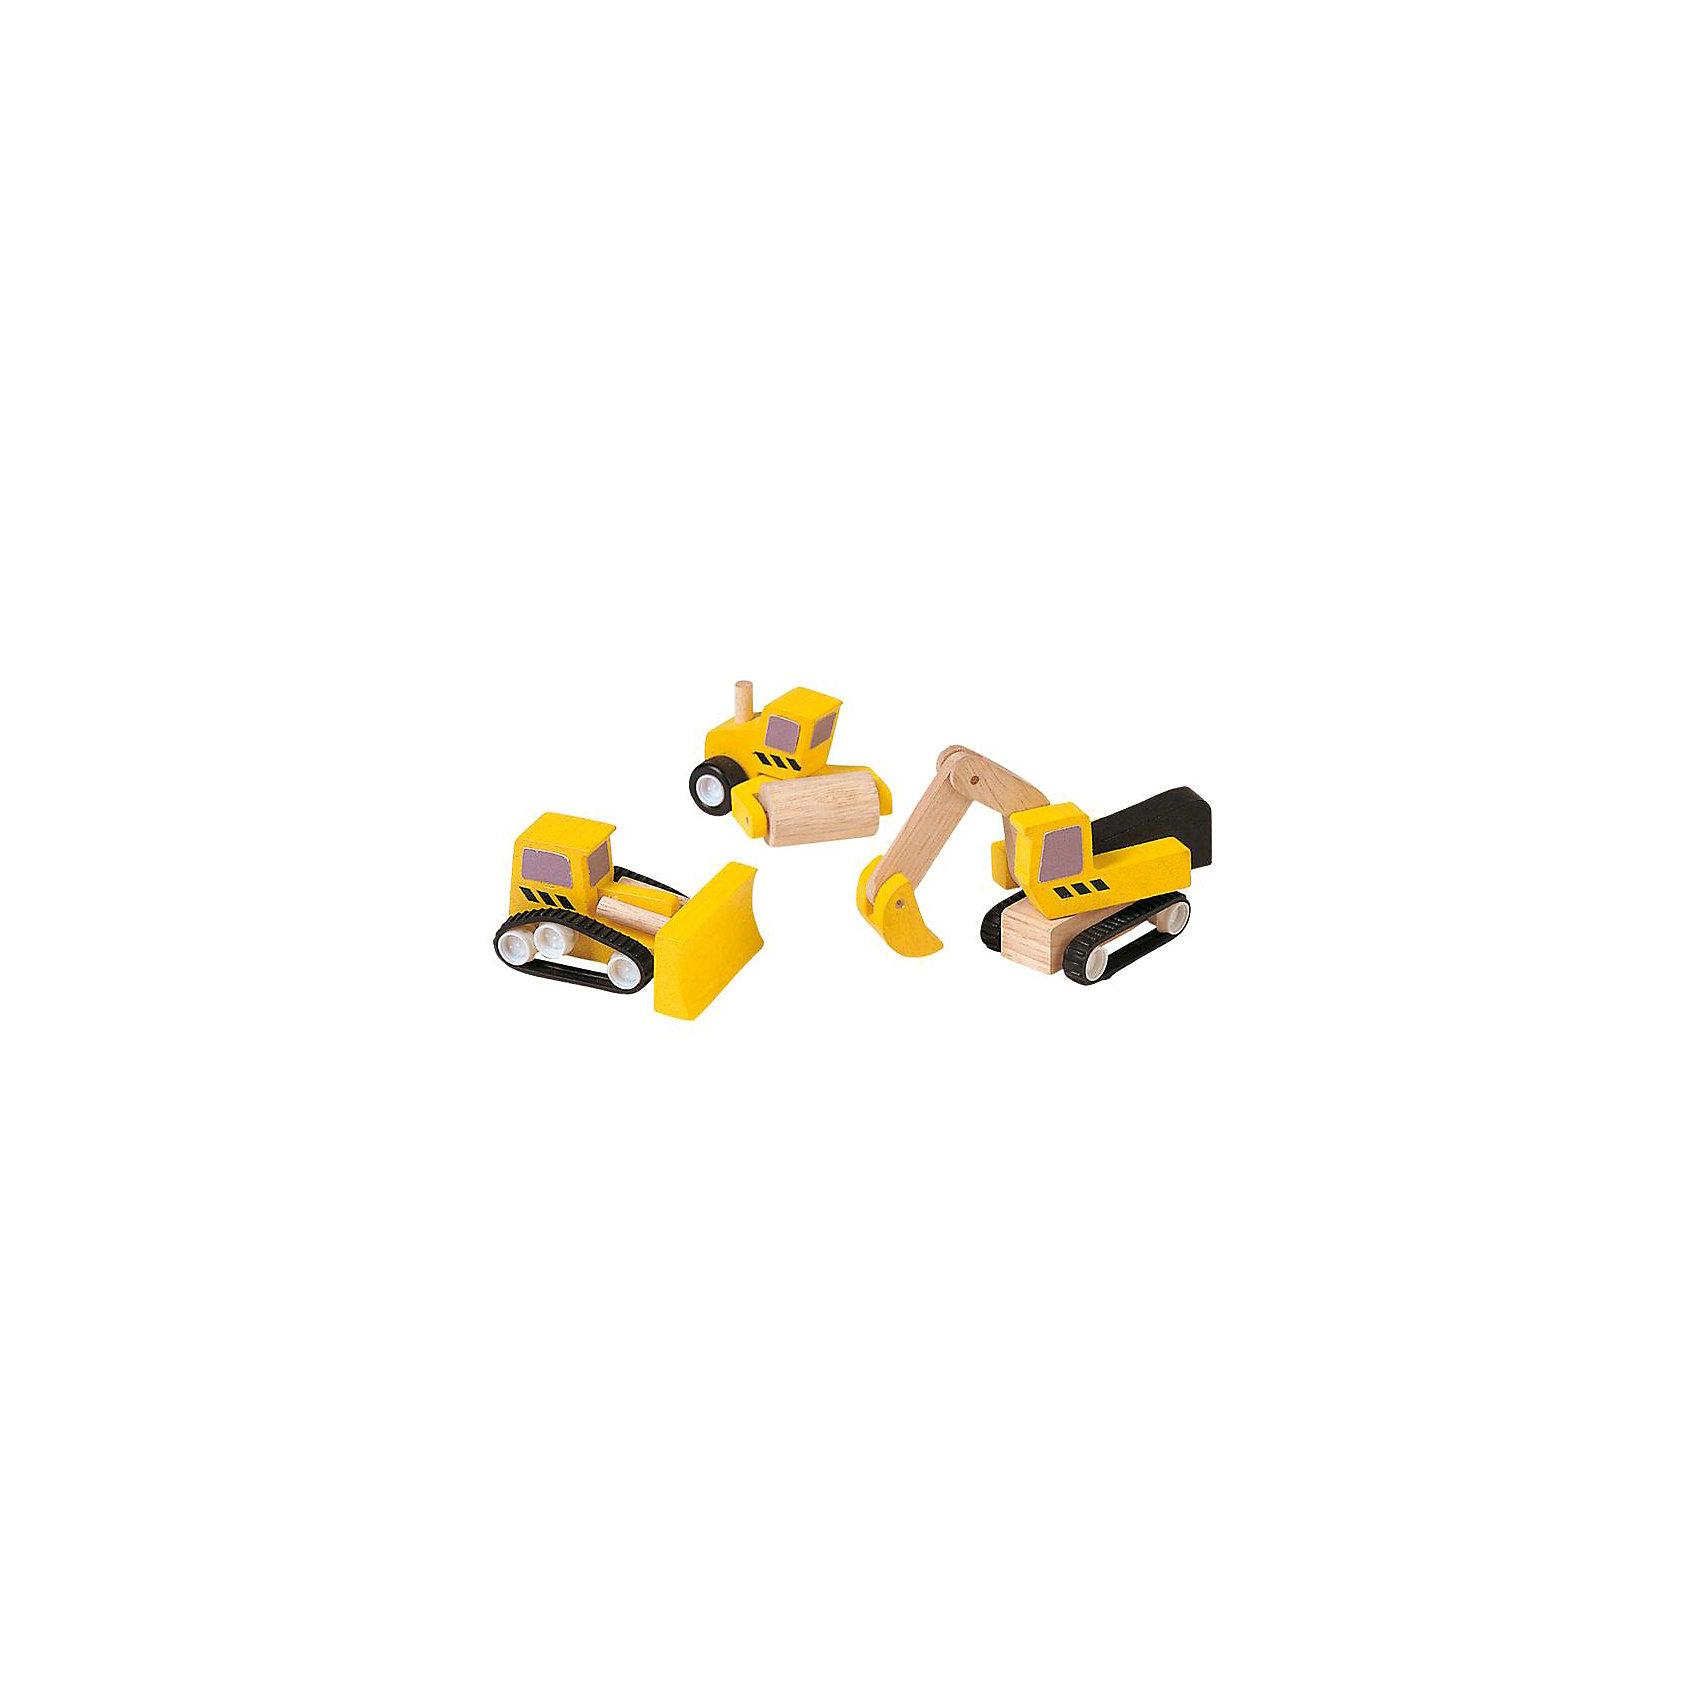 Plan Toys PLAN TOYS 6014 Дорожная техника конструкторы plan toys игра кактус